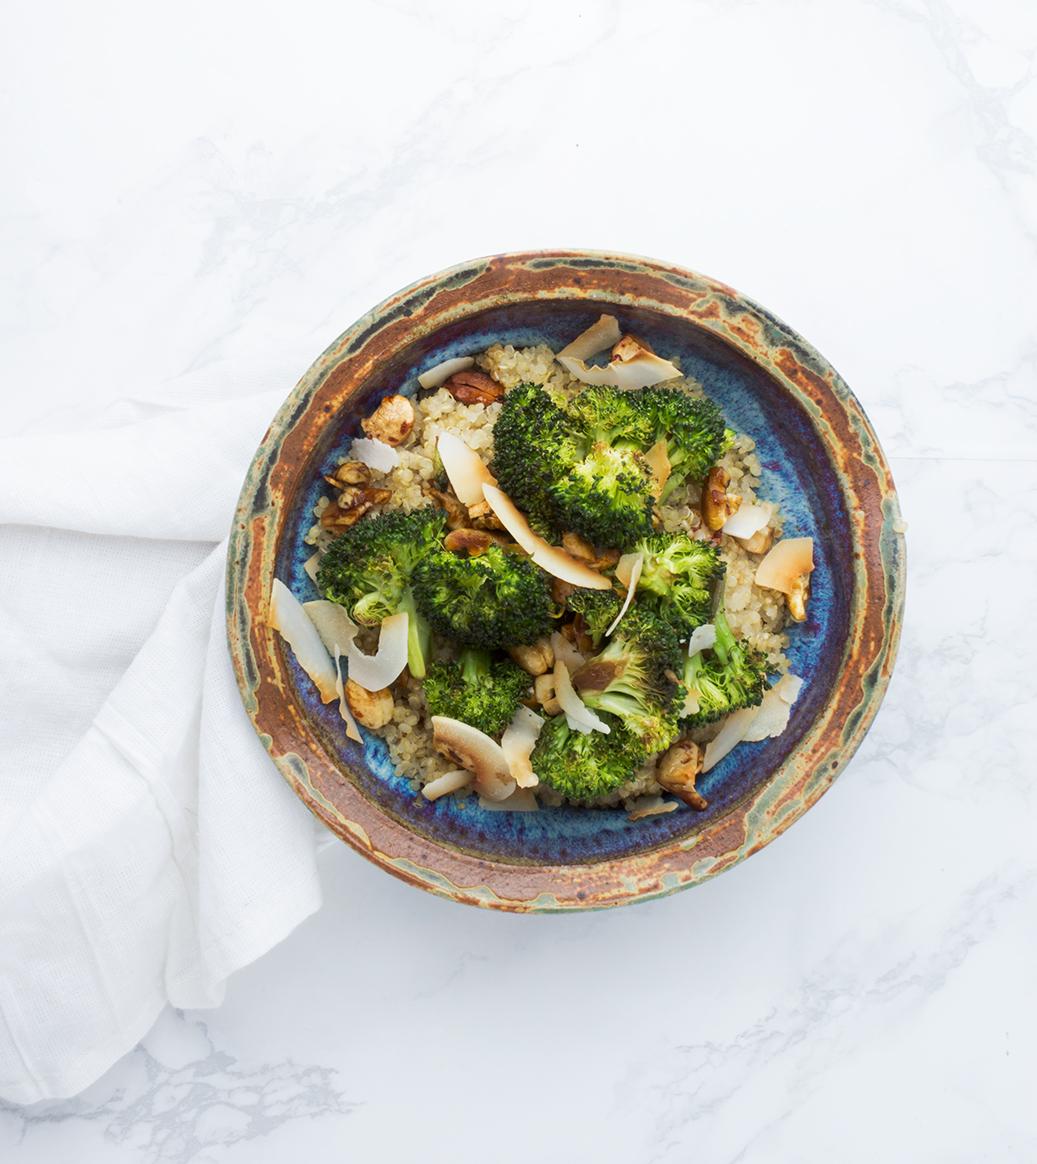 Crunchy, coconut broccoli and quinoa make meal prepping a breeze.